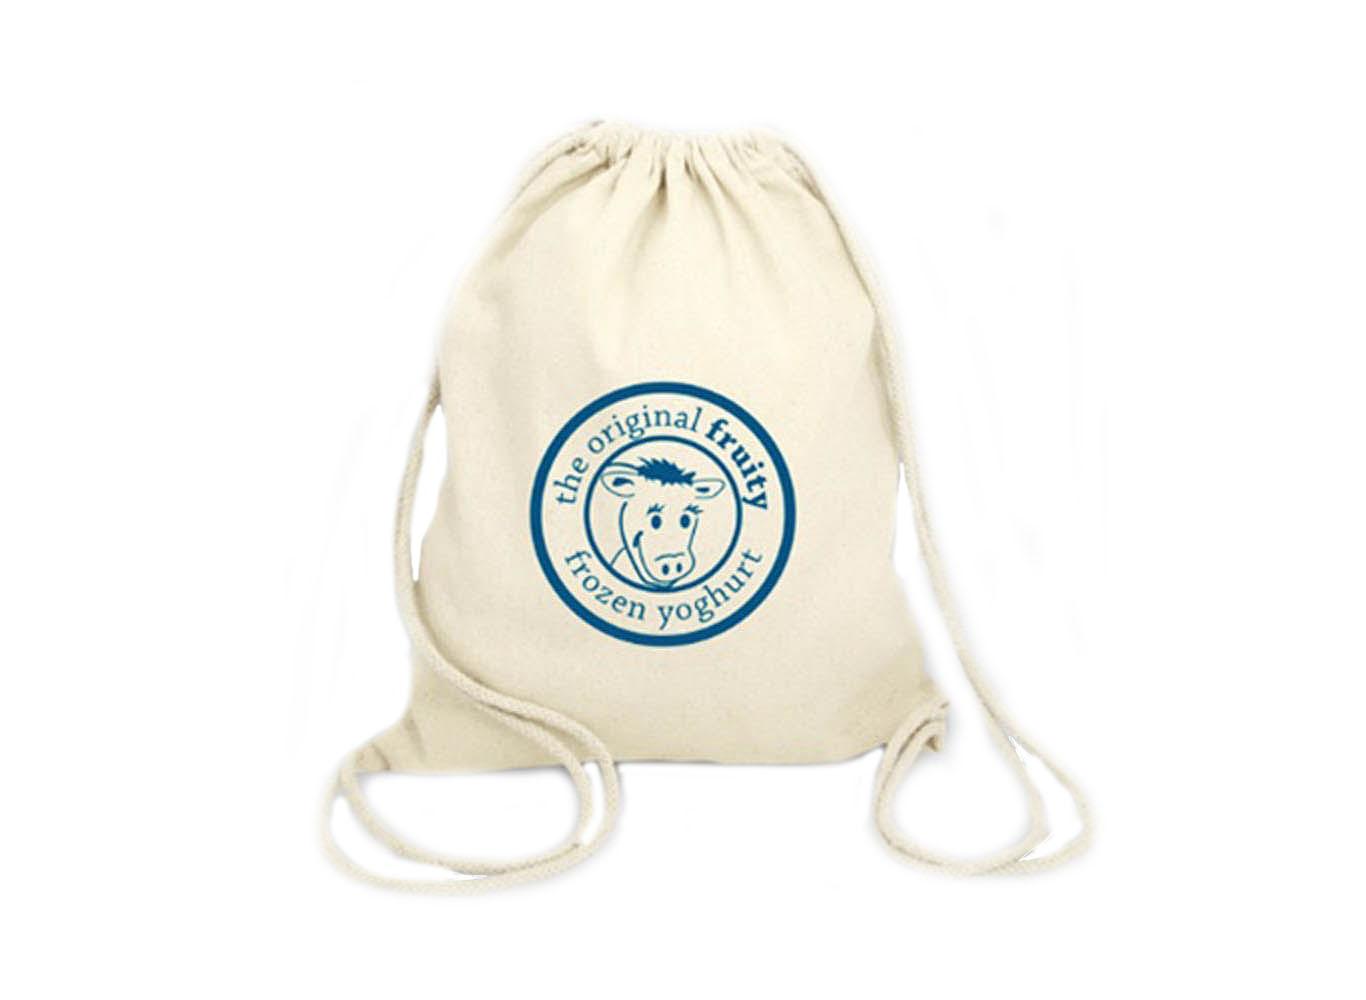 Custom Printed Cotton Canvas Drawstring Bag